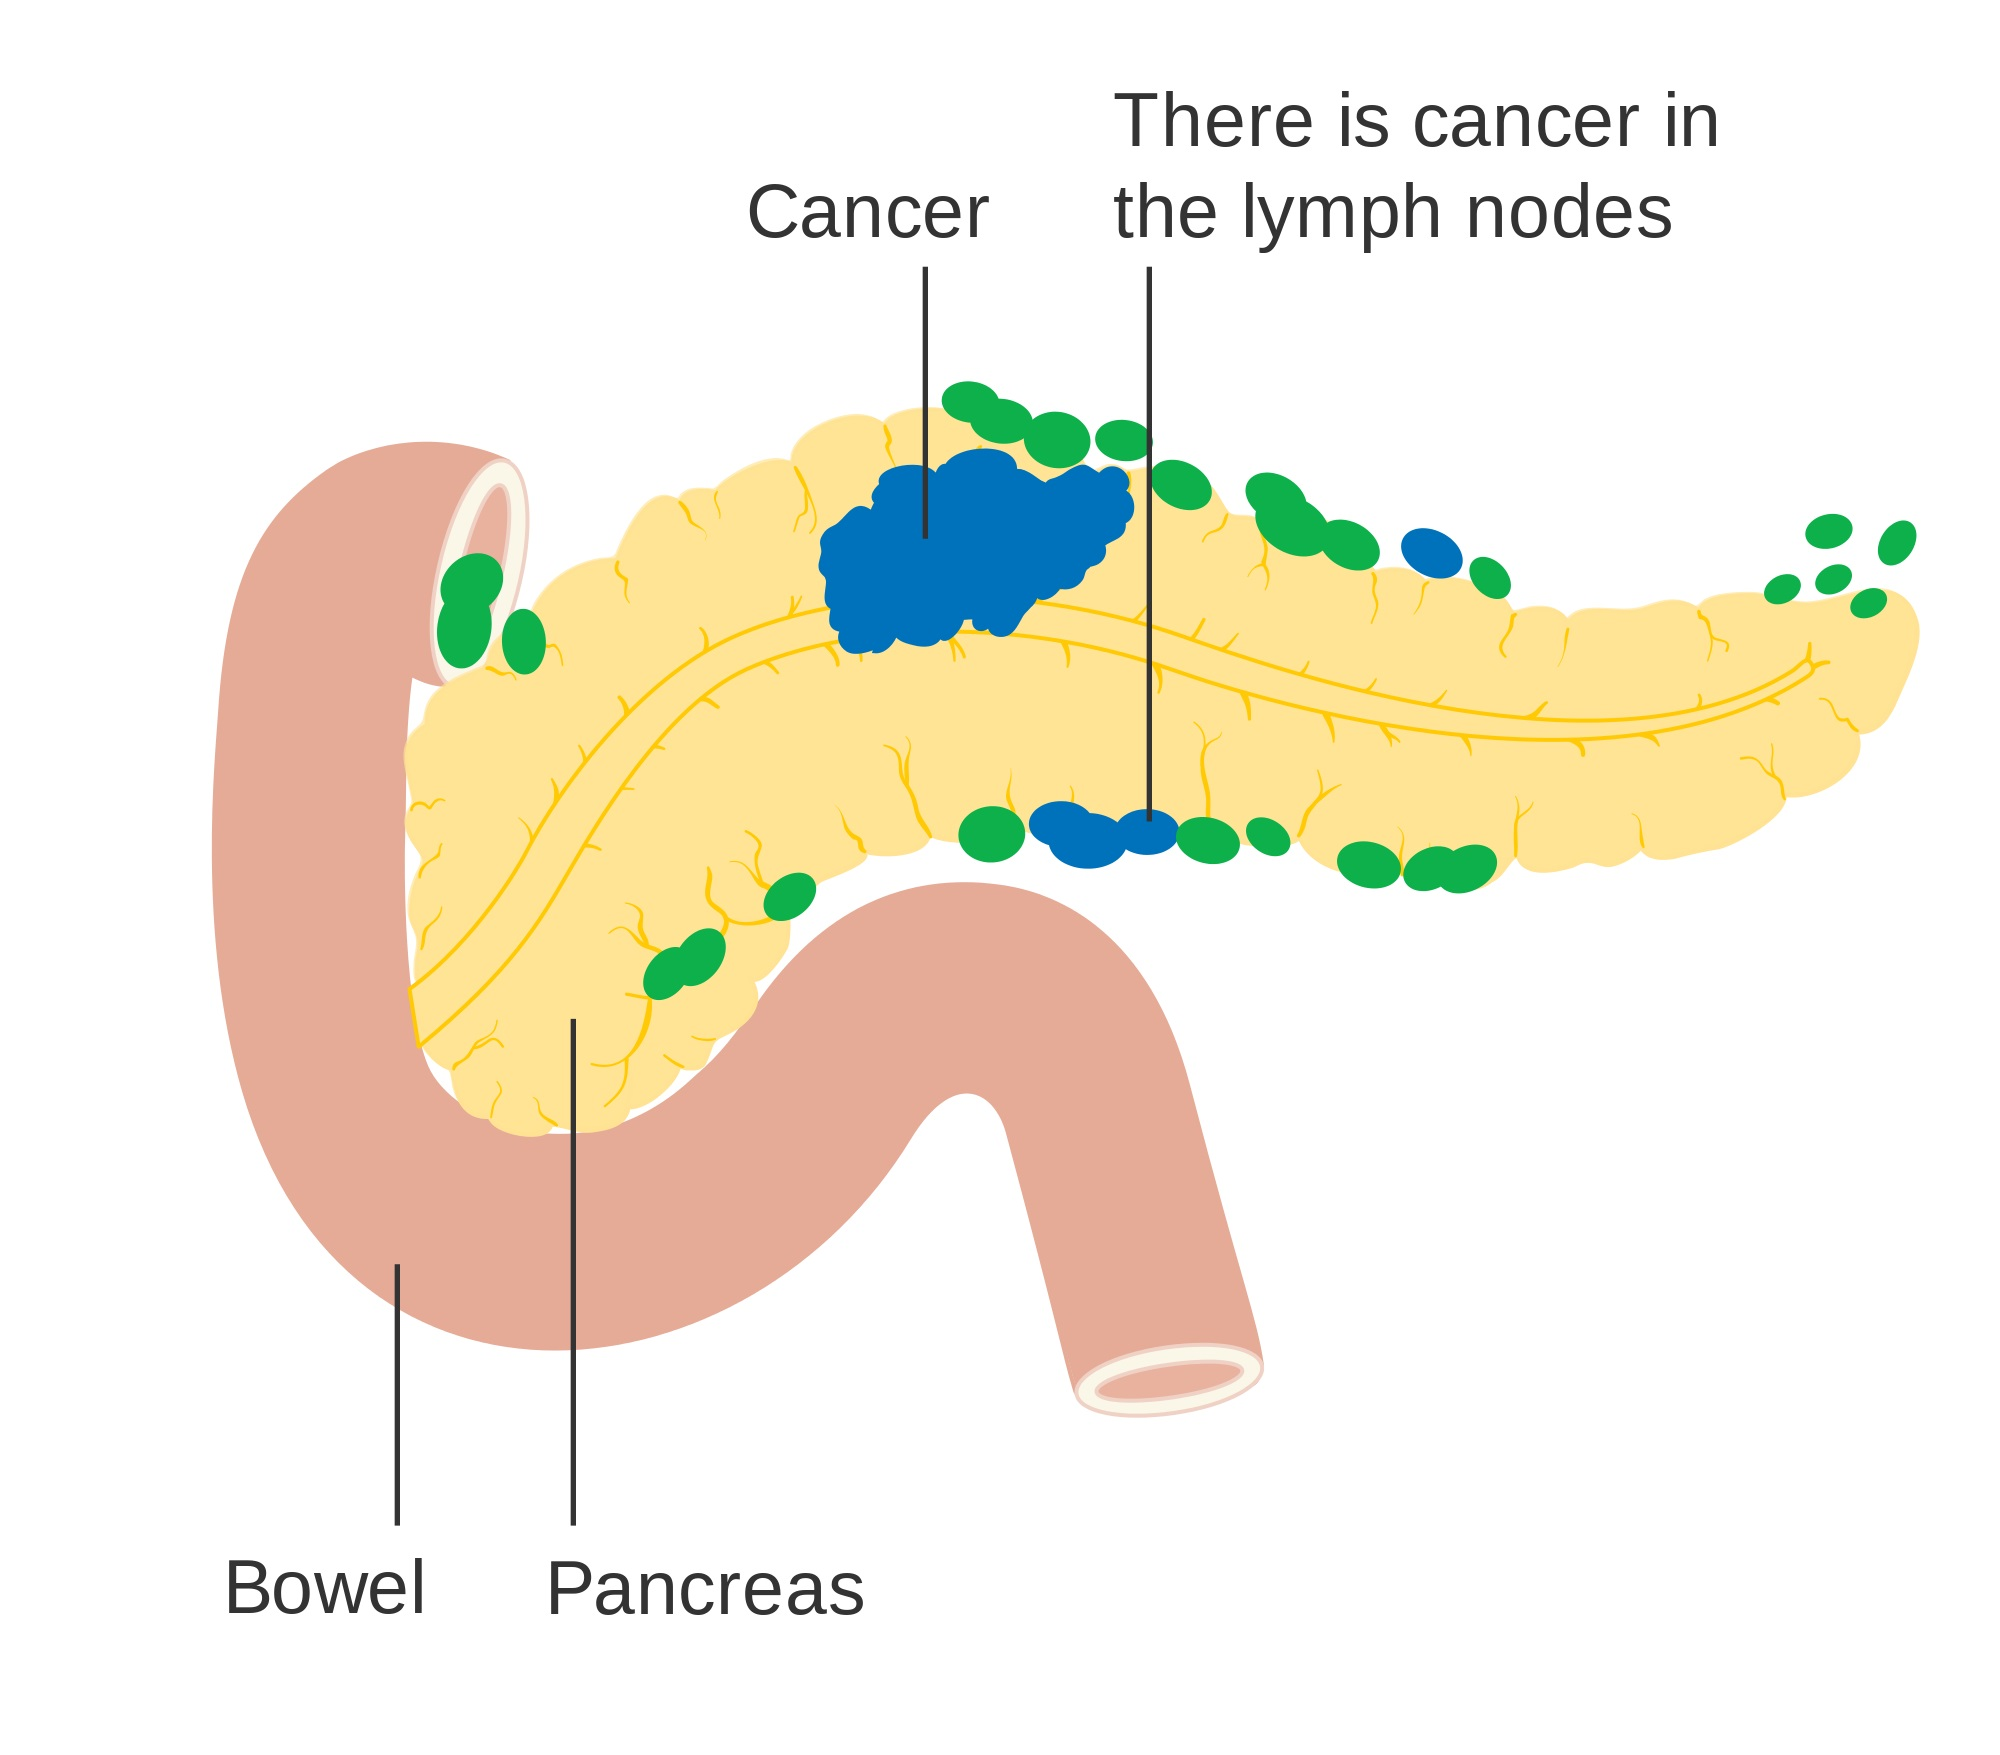 dog lymph nodes diagram 2006 mustang fuse box a diabetes diagnosis may be first symptom of pancreatic cancer